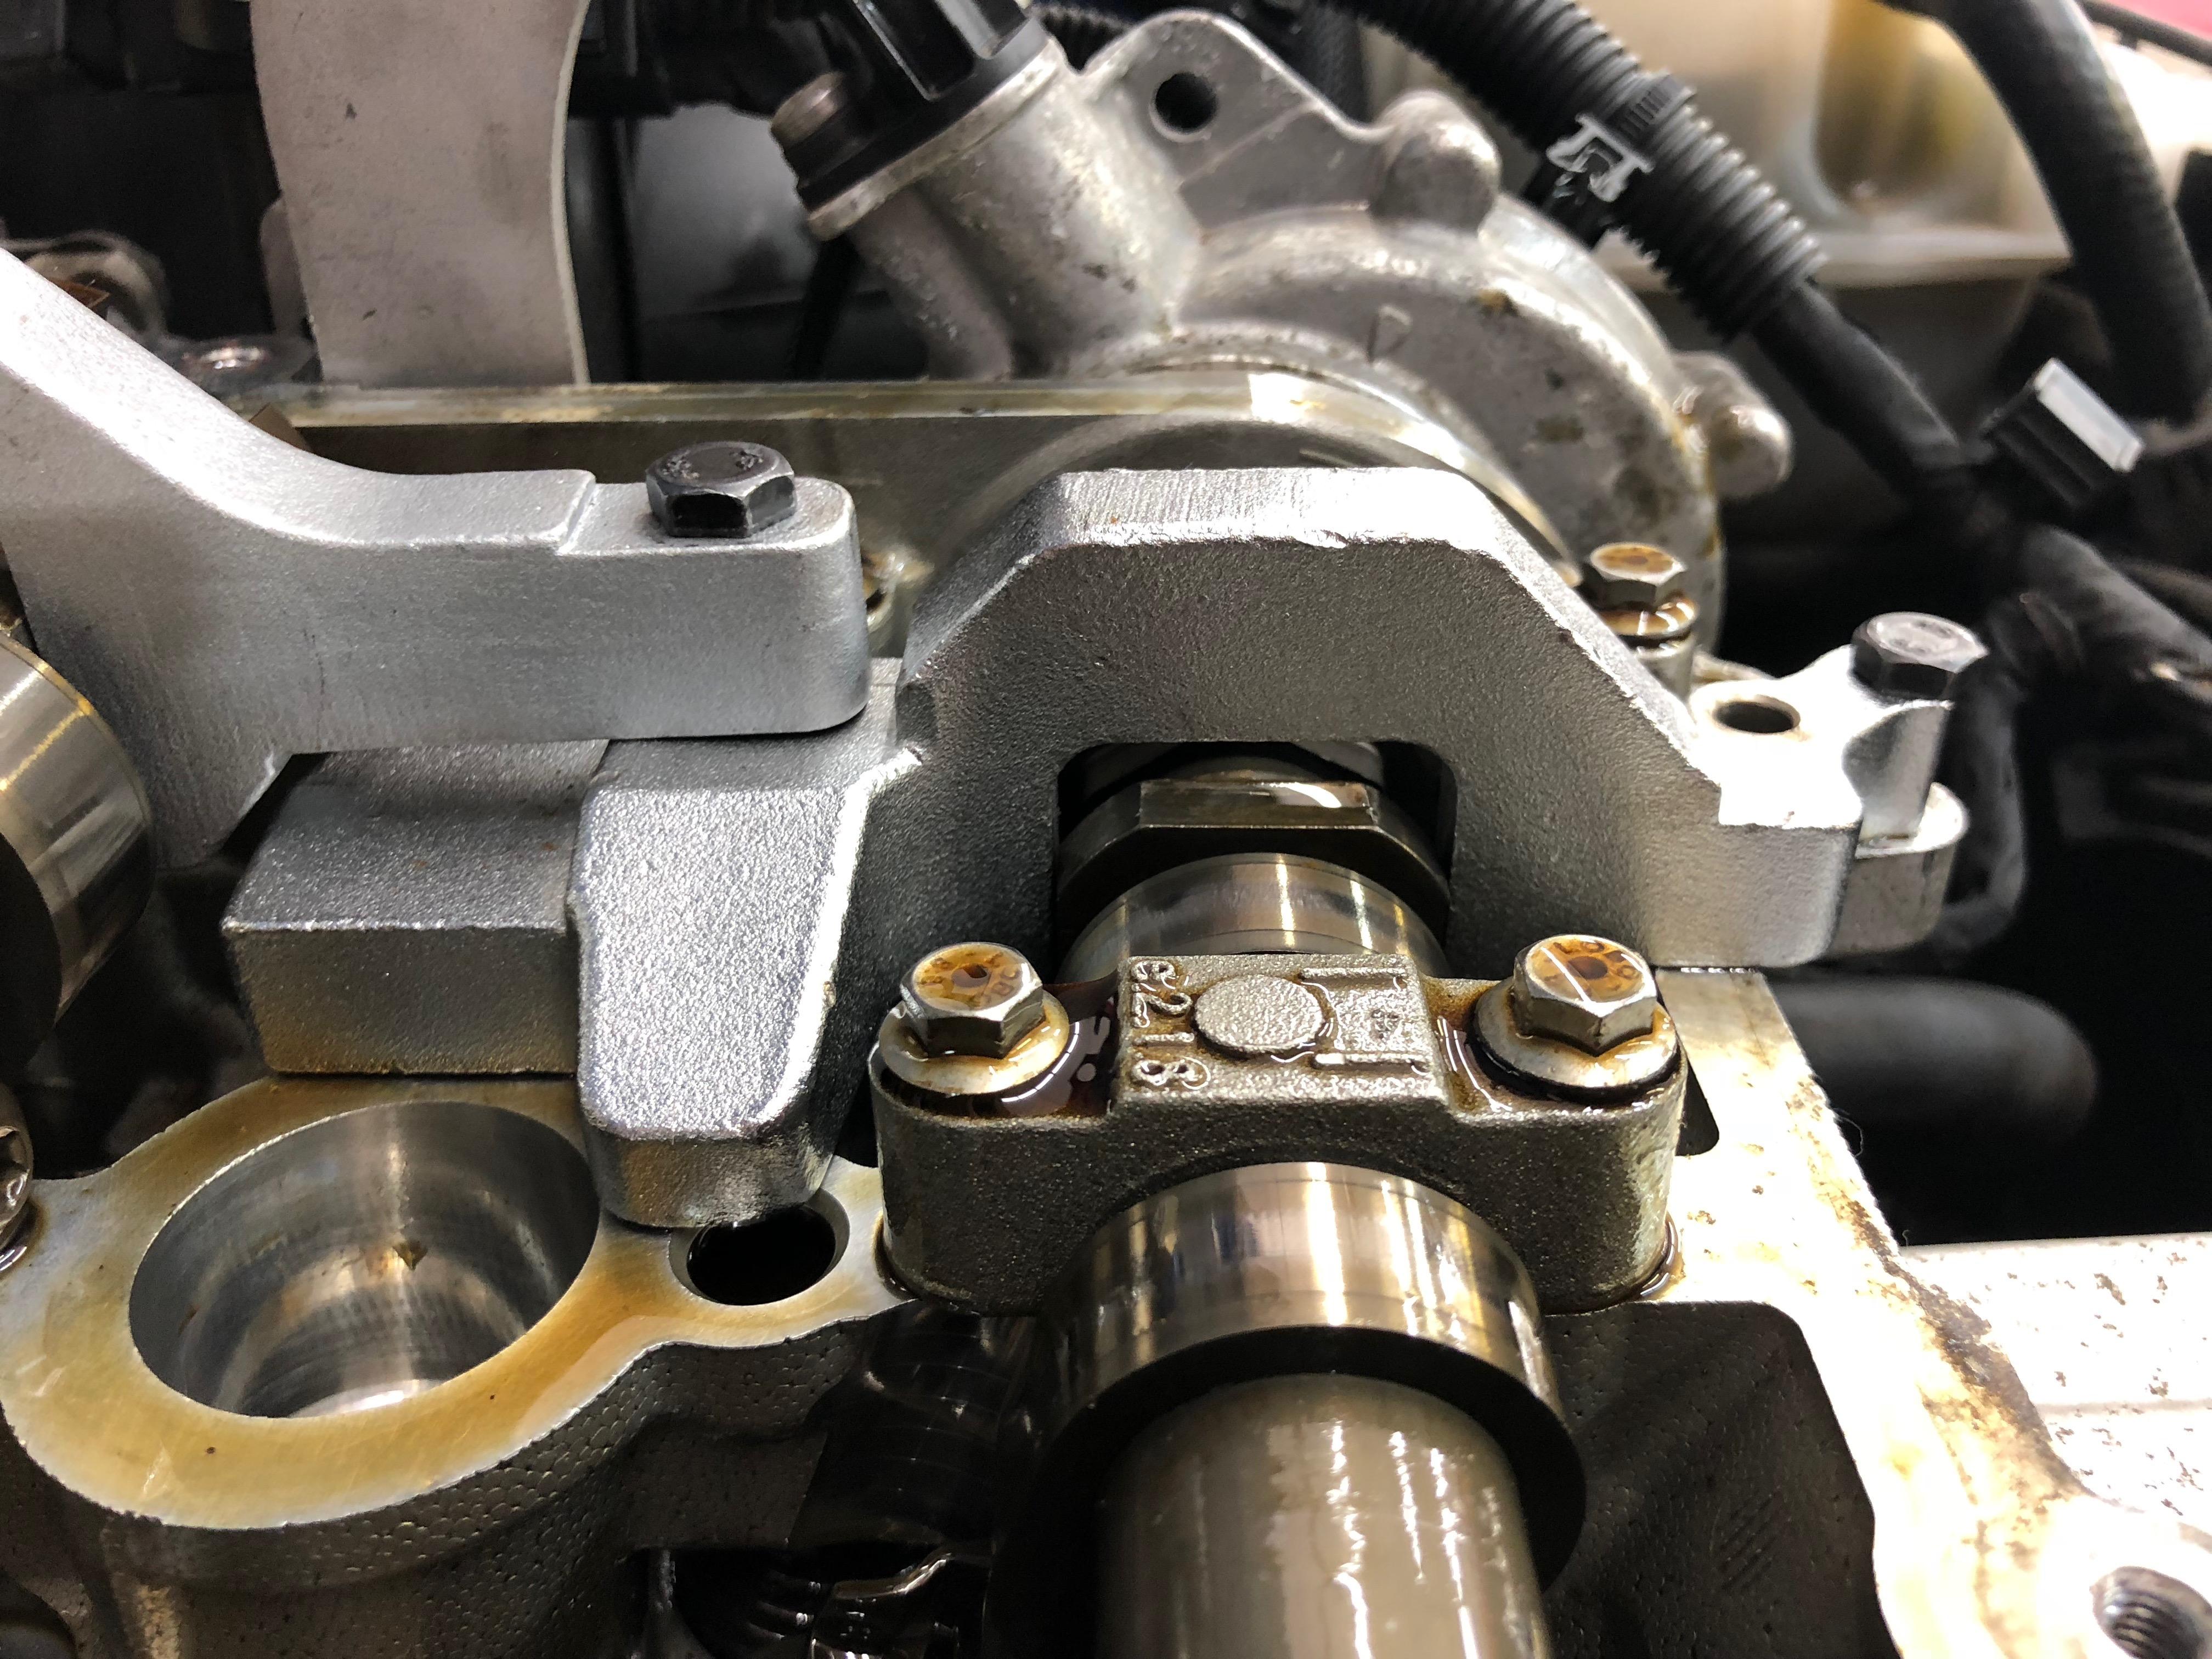 I have a 2012 MINI  Its the base 1 6 N16 Engine  Im getting the